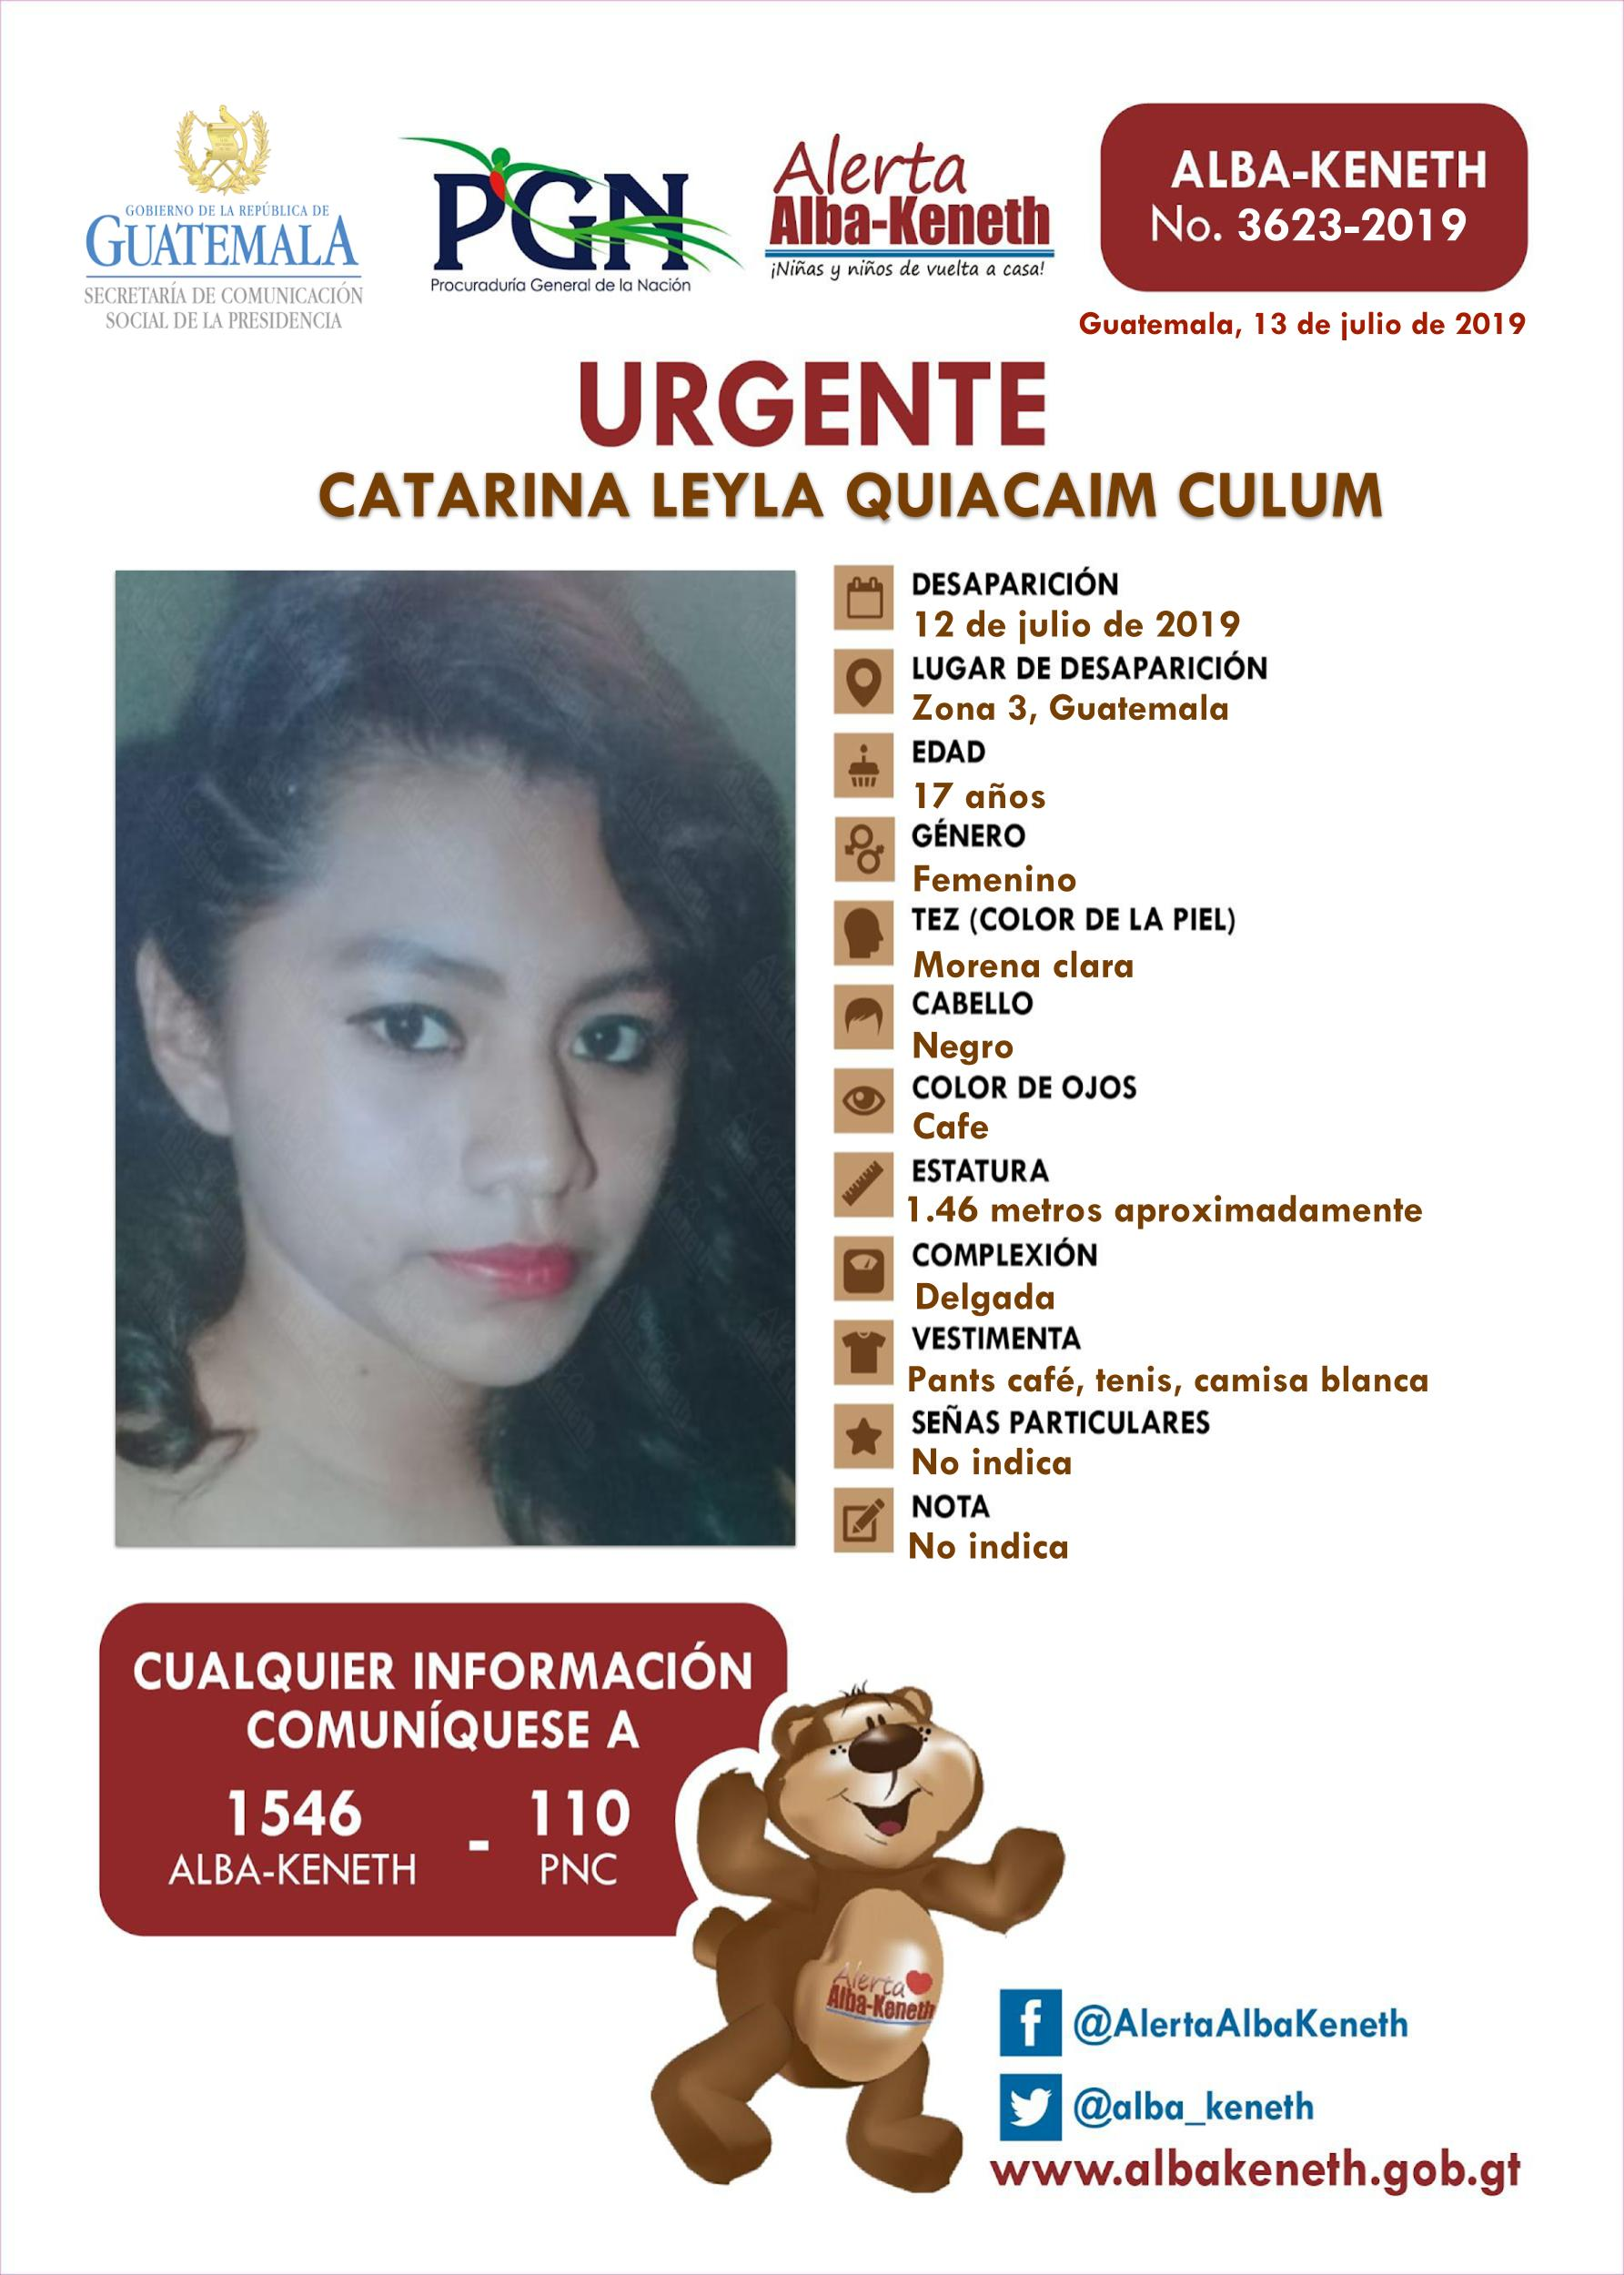 Catarina Leyla Quiacaim Culum